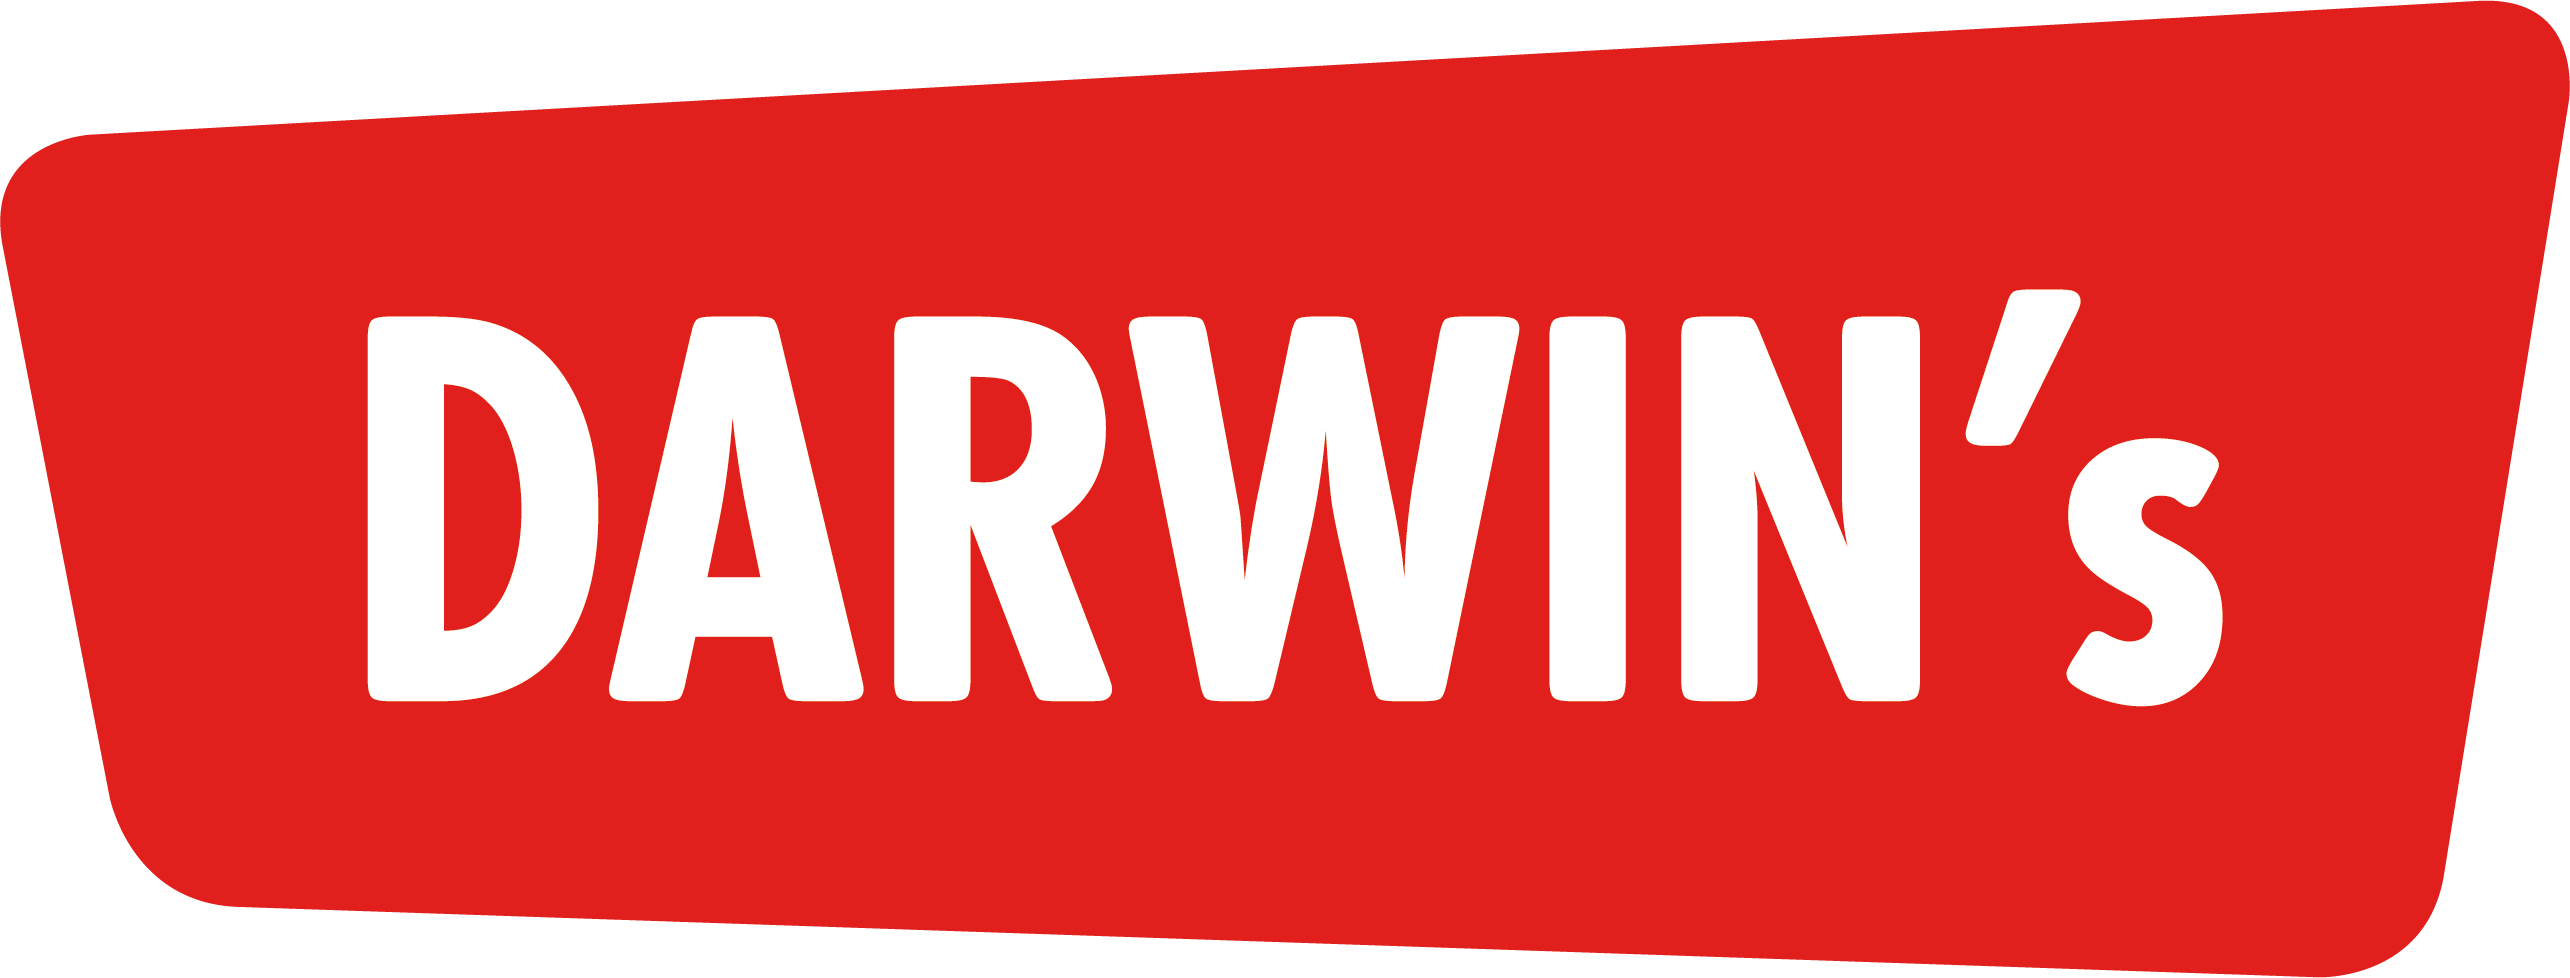 DARWINS_logo